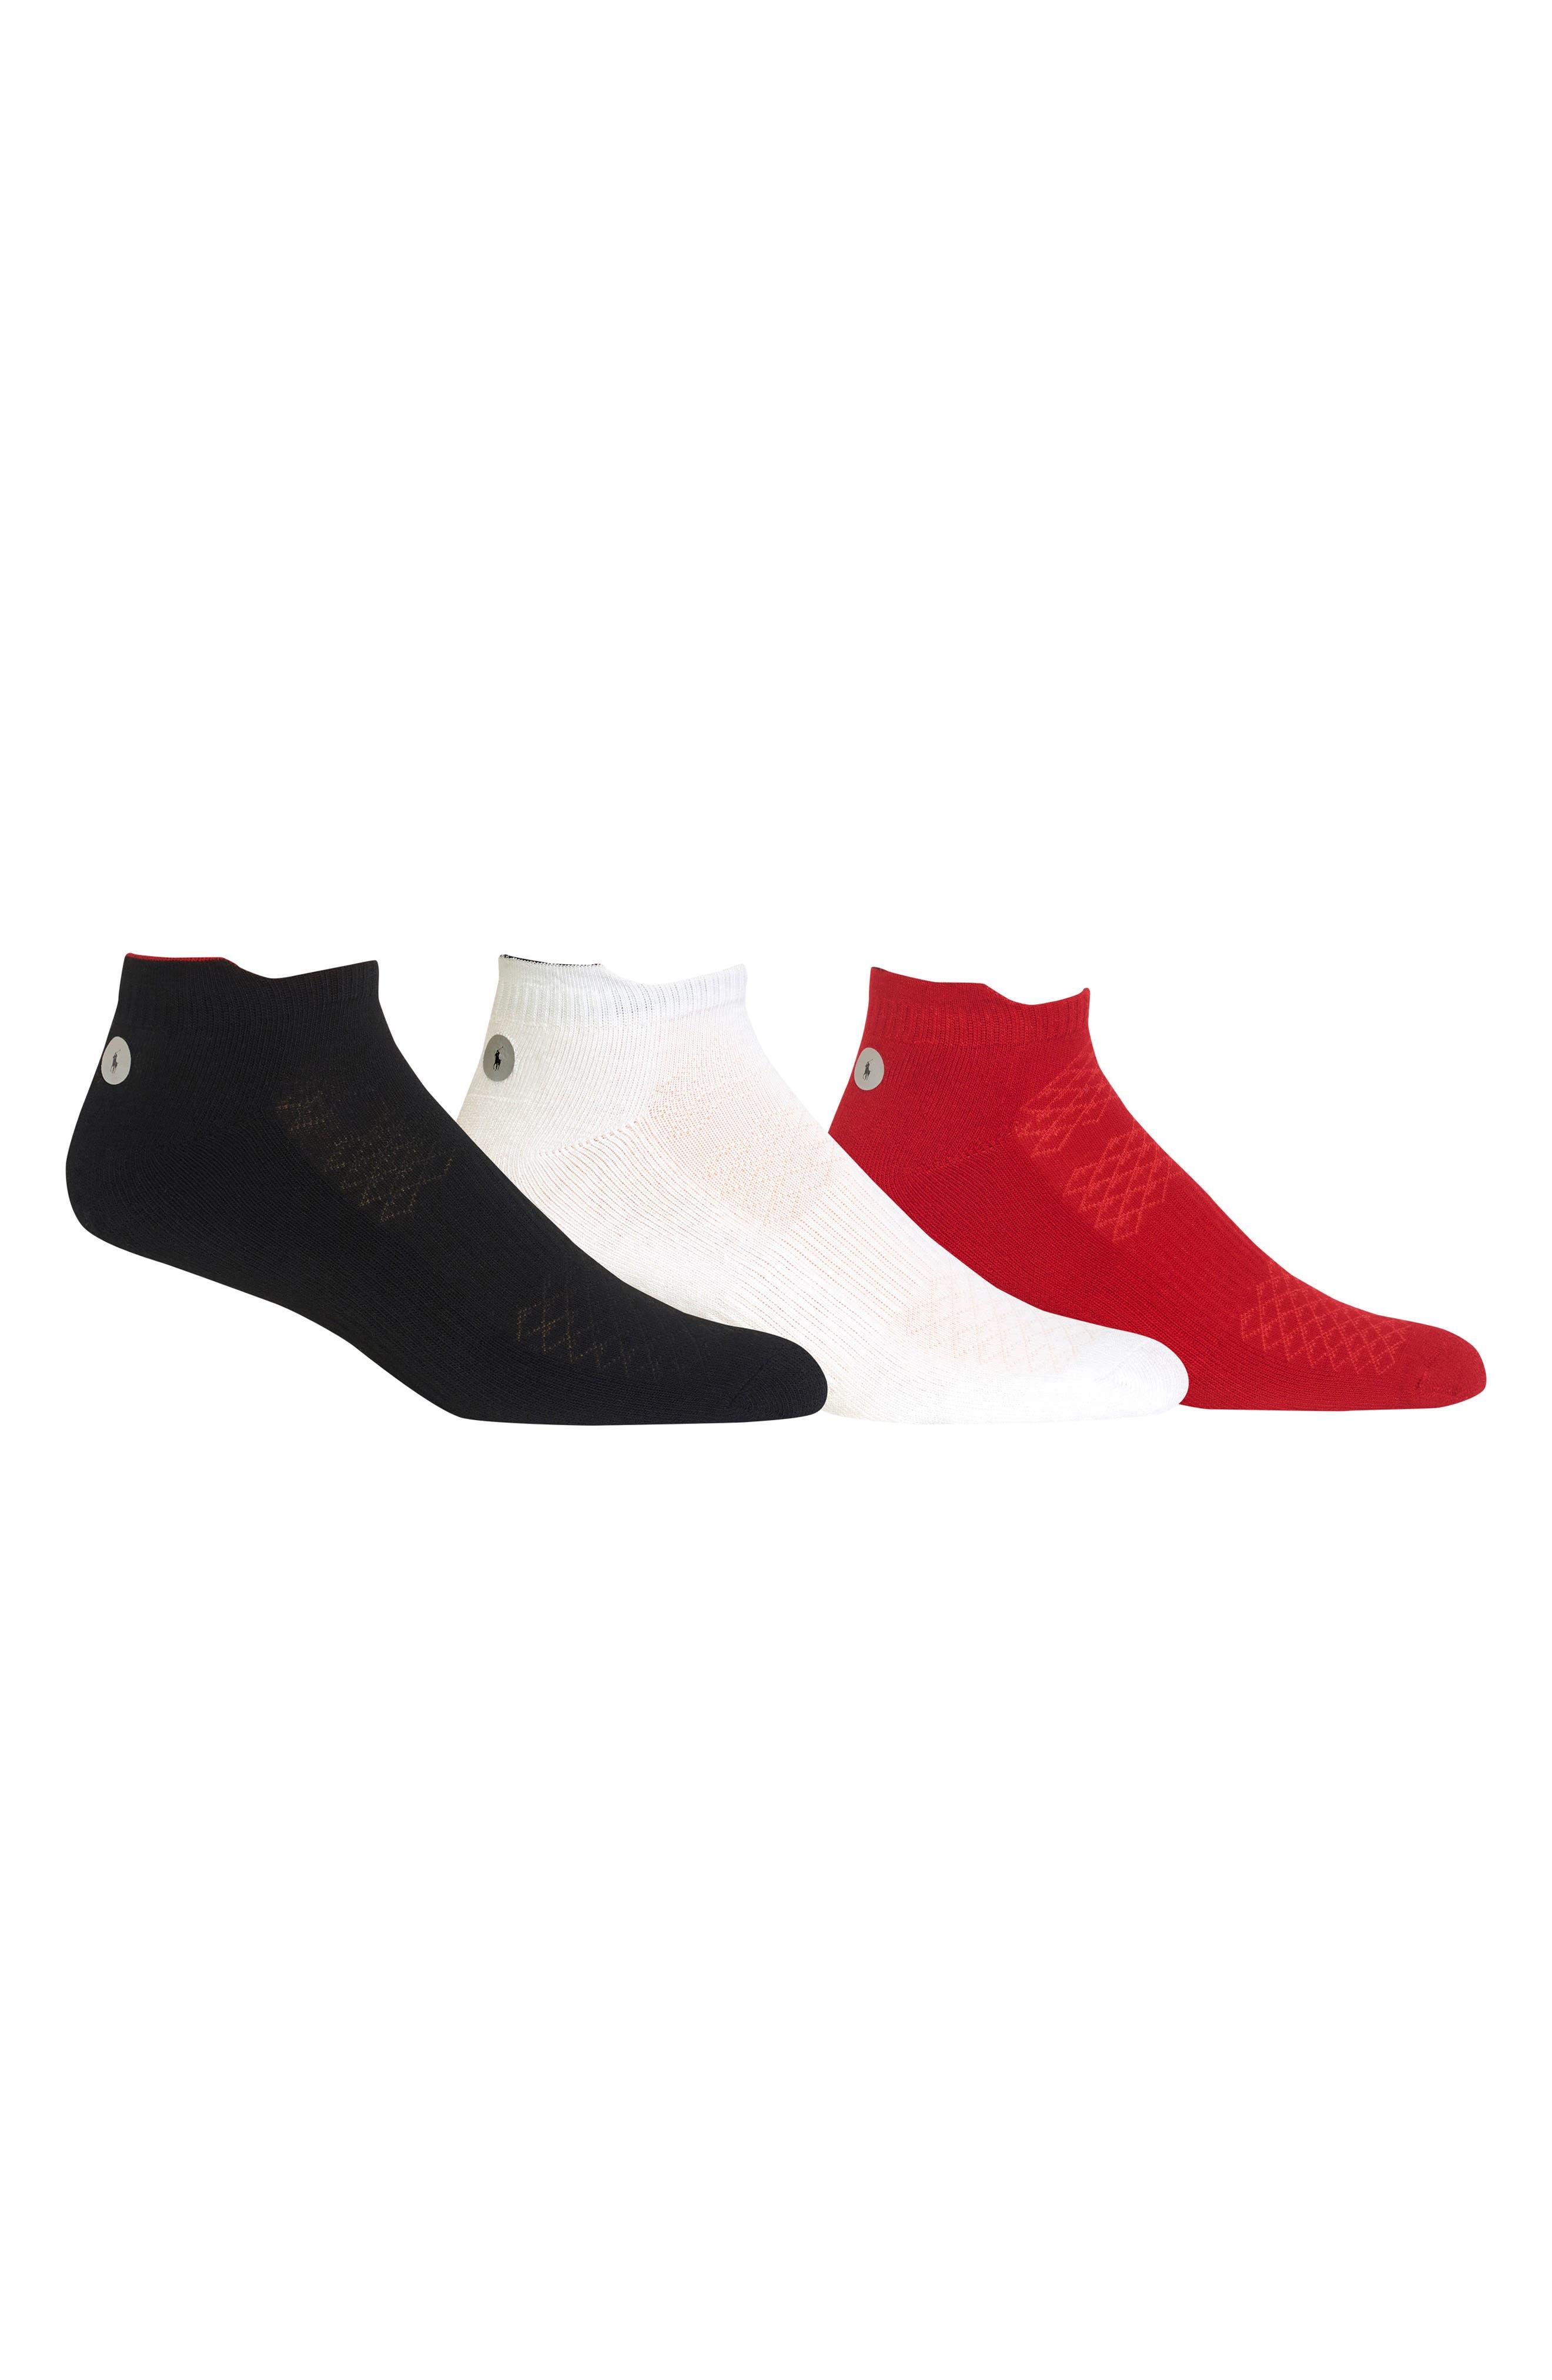 3-Pack Reflector Ankle Socks,                             Main thumbnail 1, color,                             BLACK MULTI